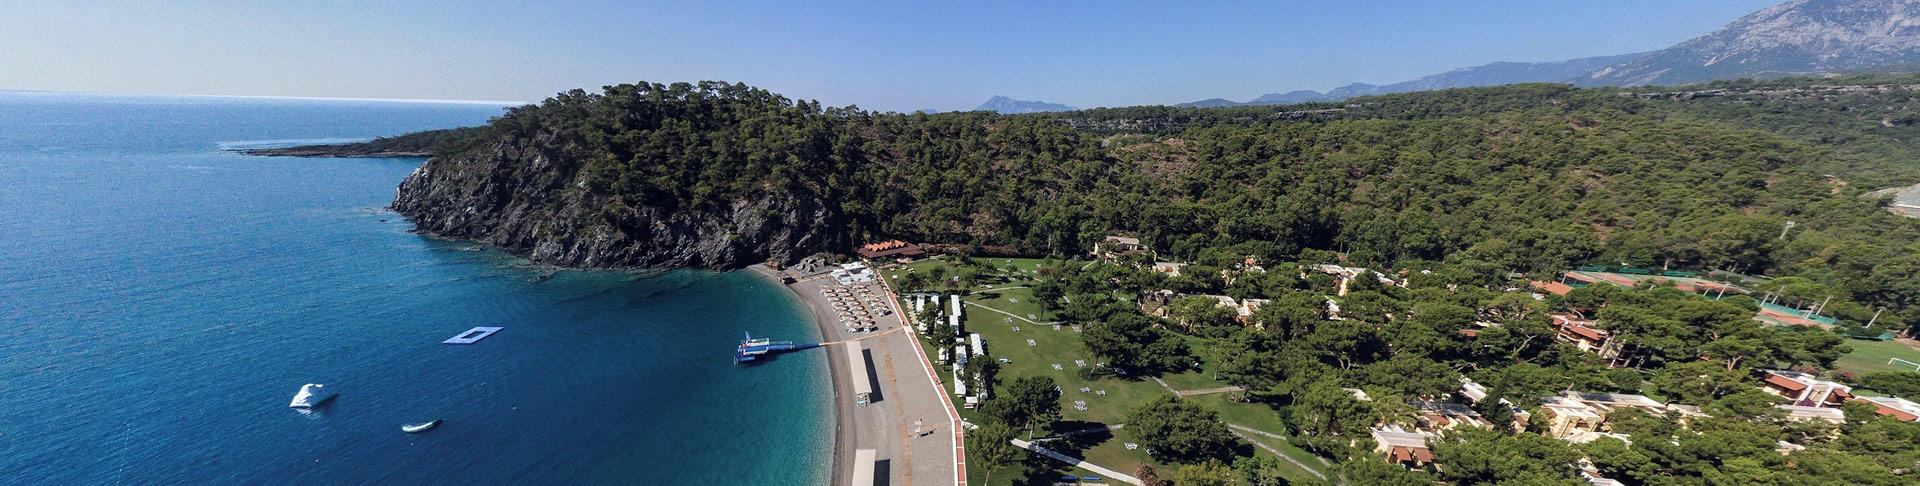 Camyuva transfert aéroport en taxi de / à l'hôtel de vacances transferts aéroport d'Antalya vacances voyage Turquie